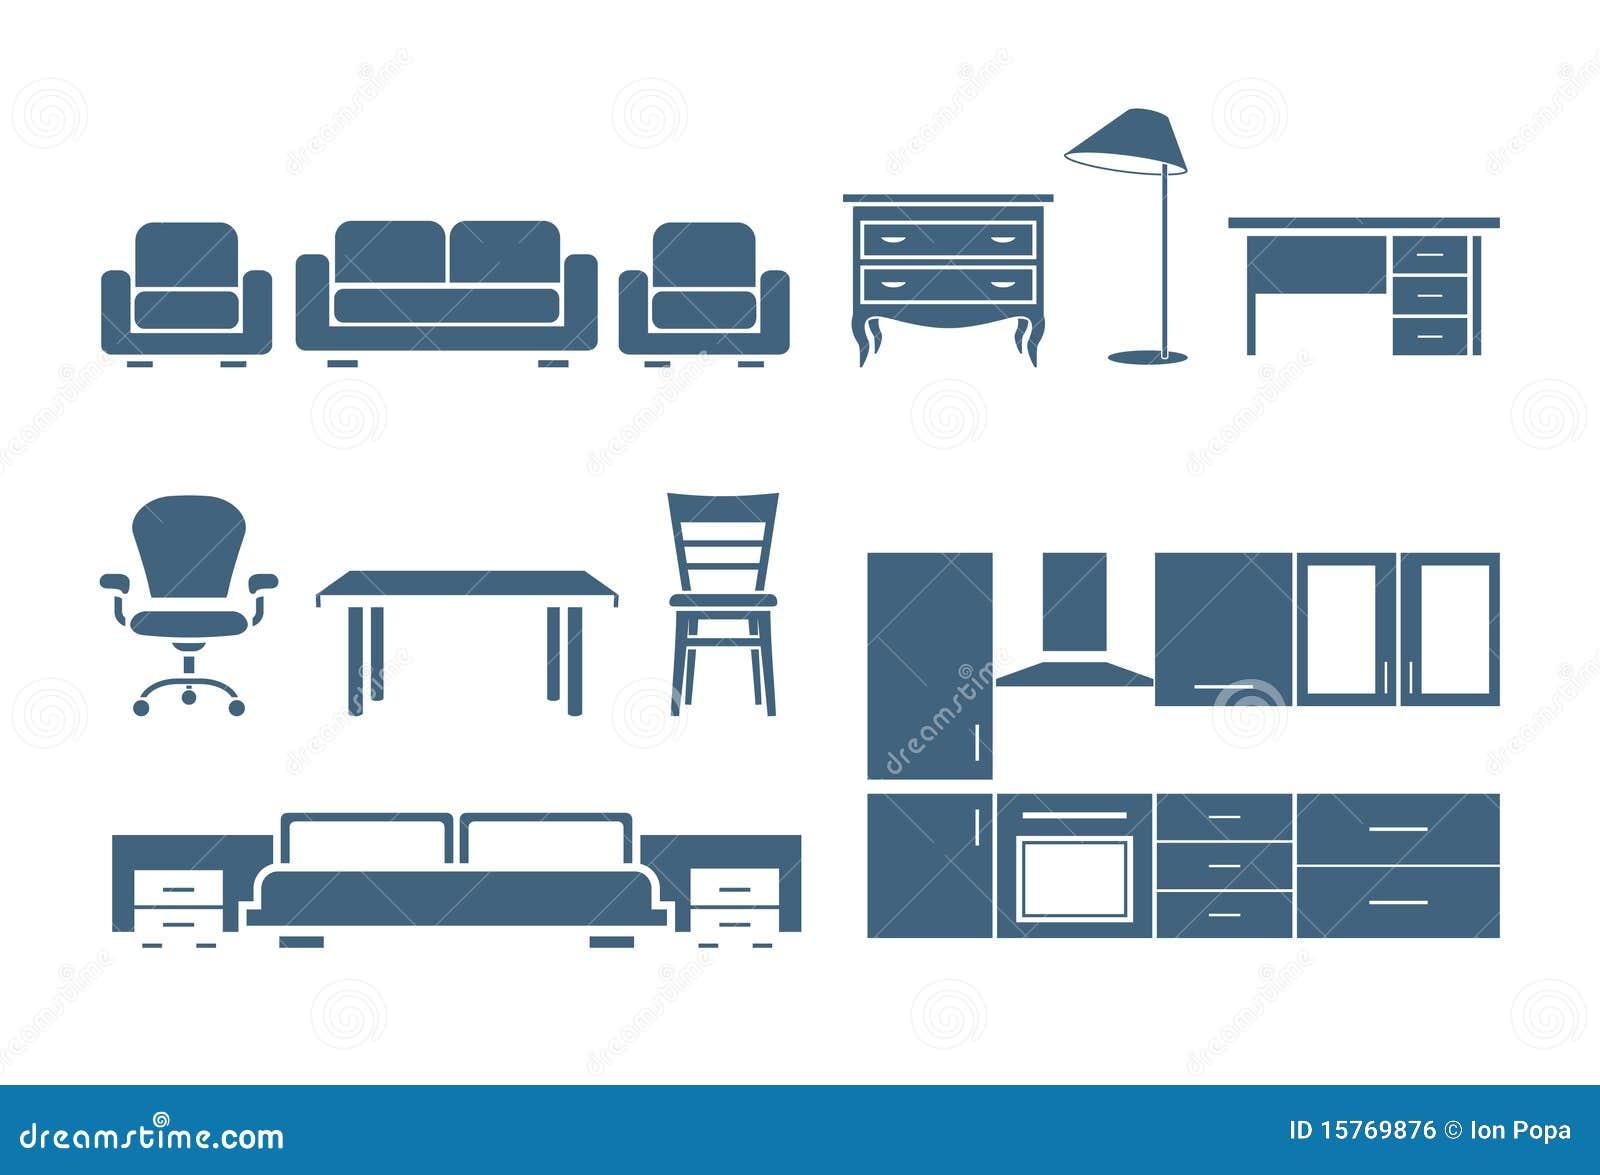 Furniture Icons Royalty Free Stock Image Image 15769876